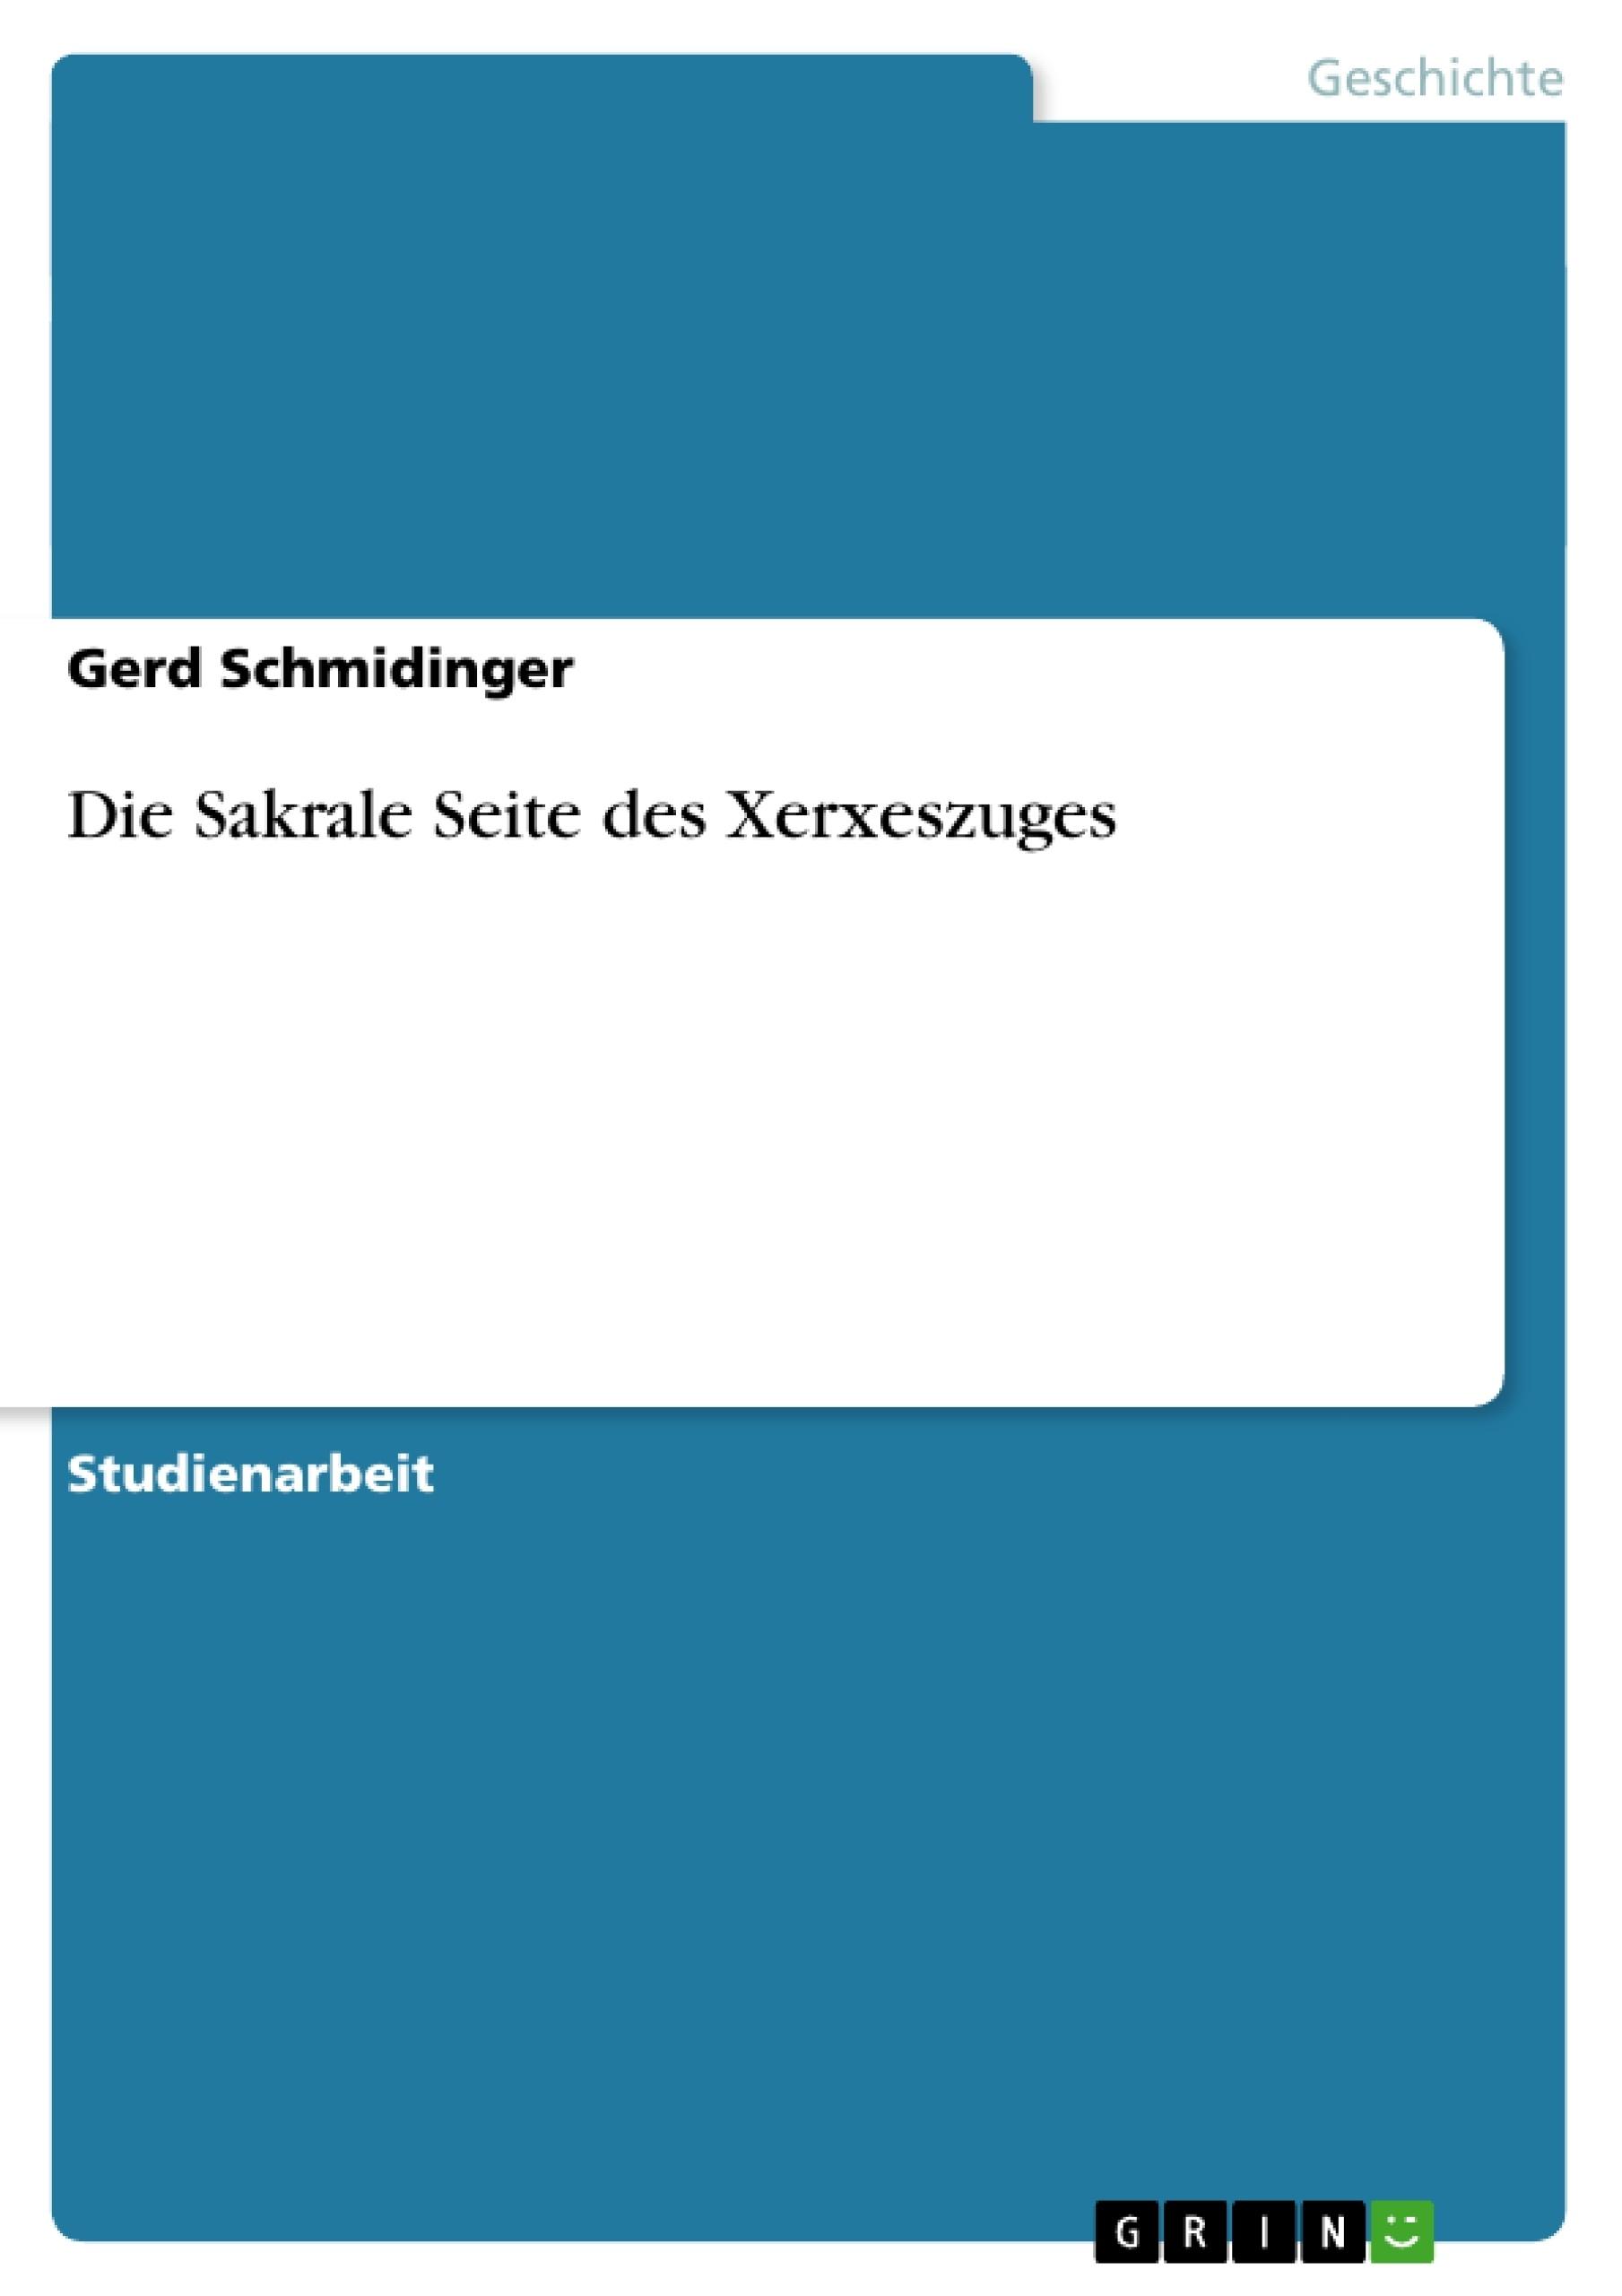 Titel: Die Sakrale Seite des Xerxeszuges